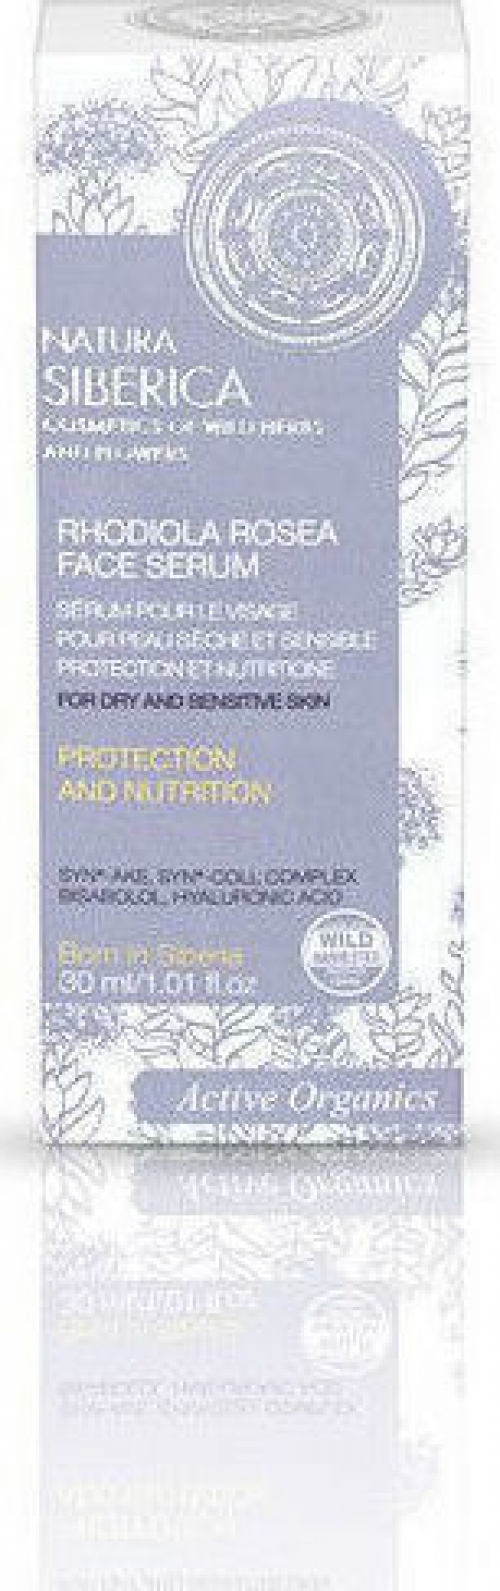 Rhodiola Rosea Face Serum, Προστασία και Θρέψη, για Ξηρές και Ευαίσθητες επιδερμίδες, 30 ml (Κατάλληλο για όλες τις ηλικίες)